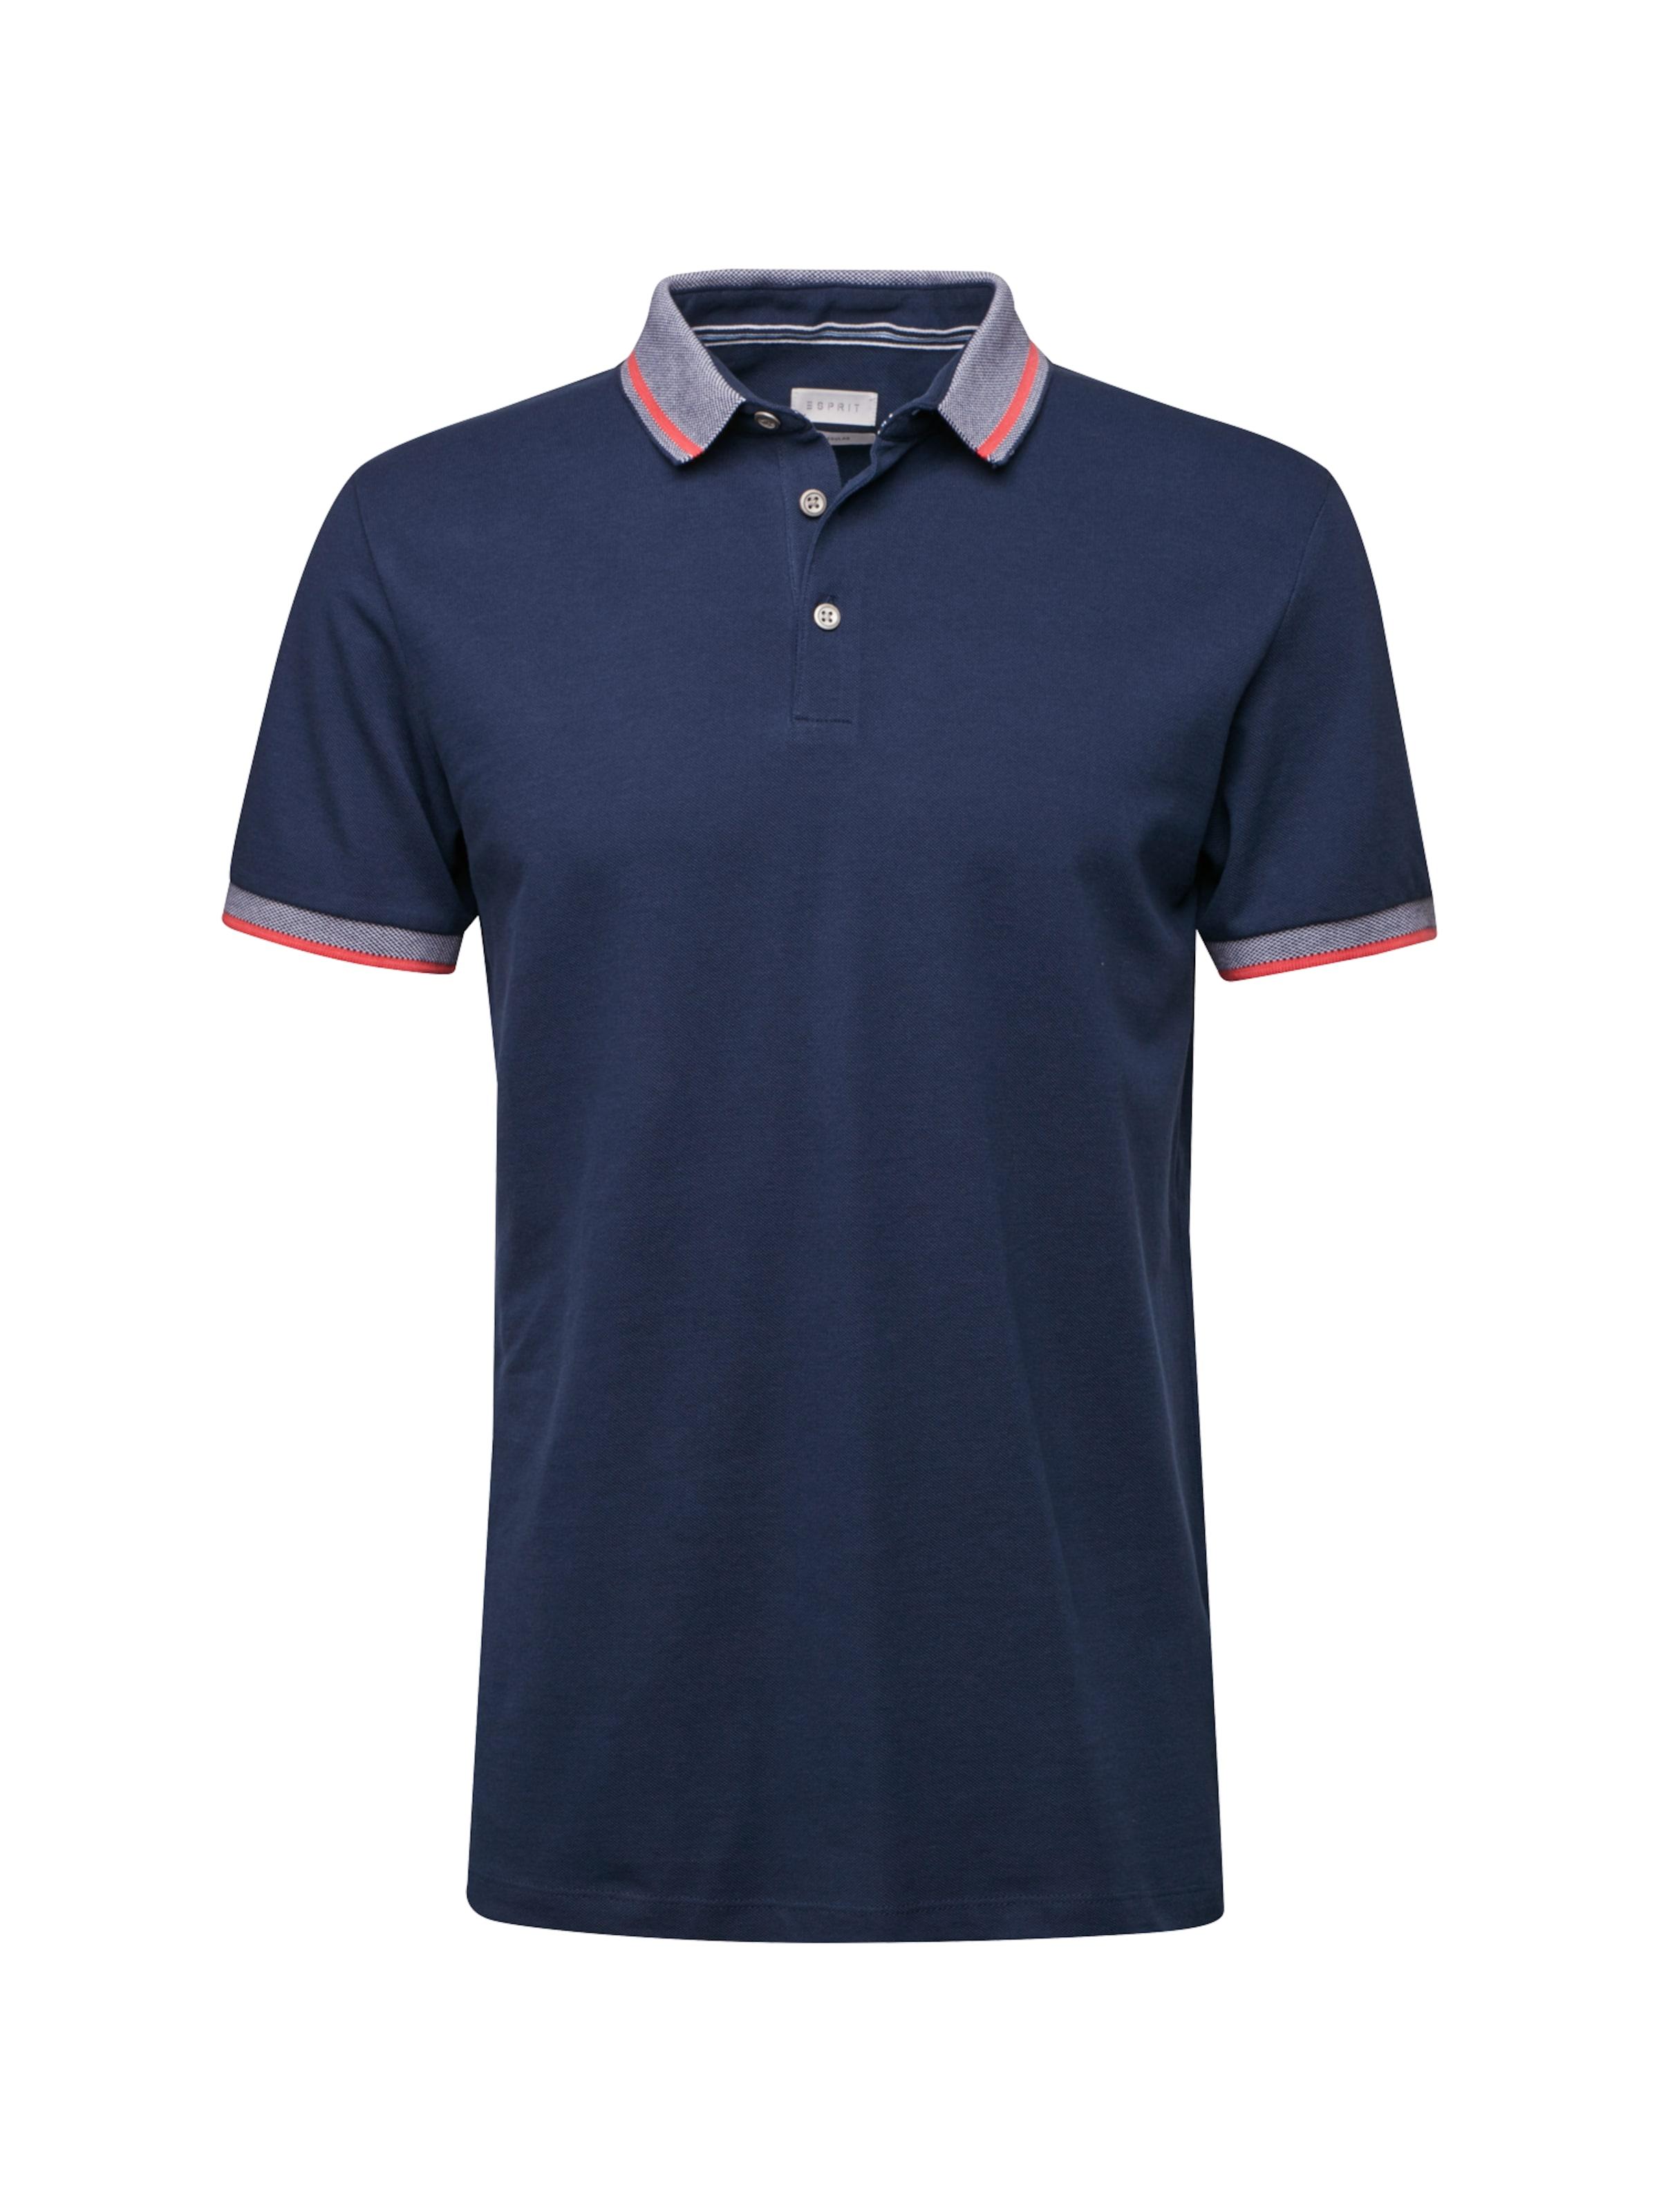 En Marine 'f Po' Esprit Basic Plus T shirt Bleu 2YE9IWeDHb